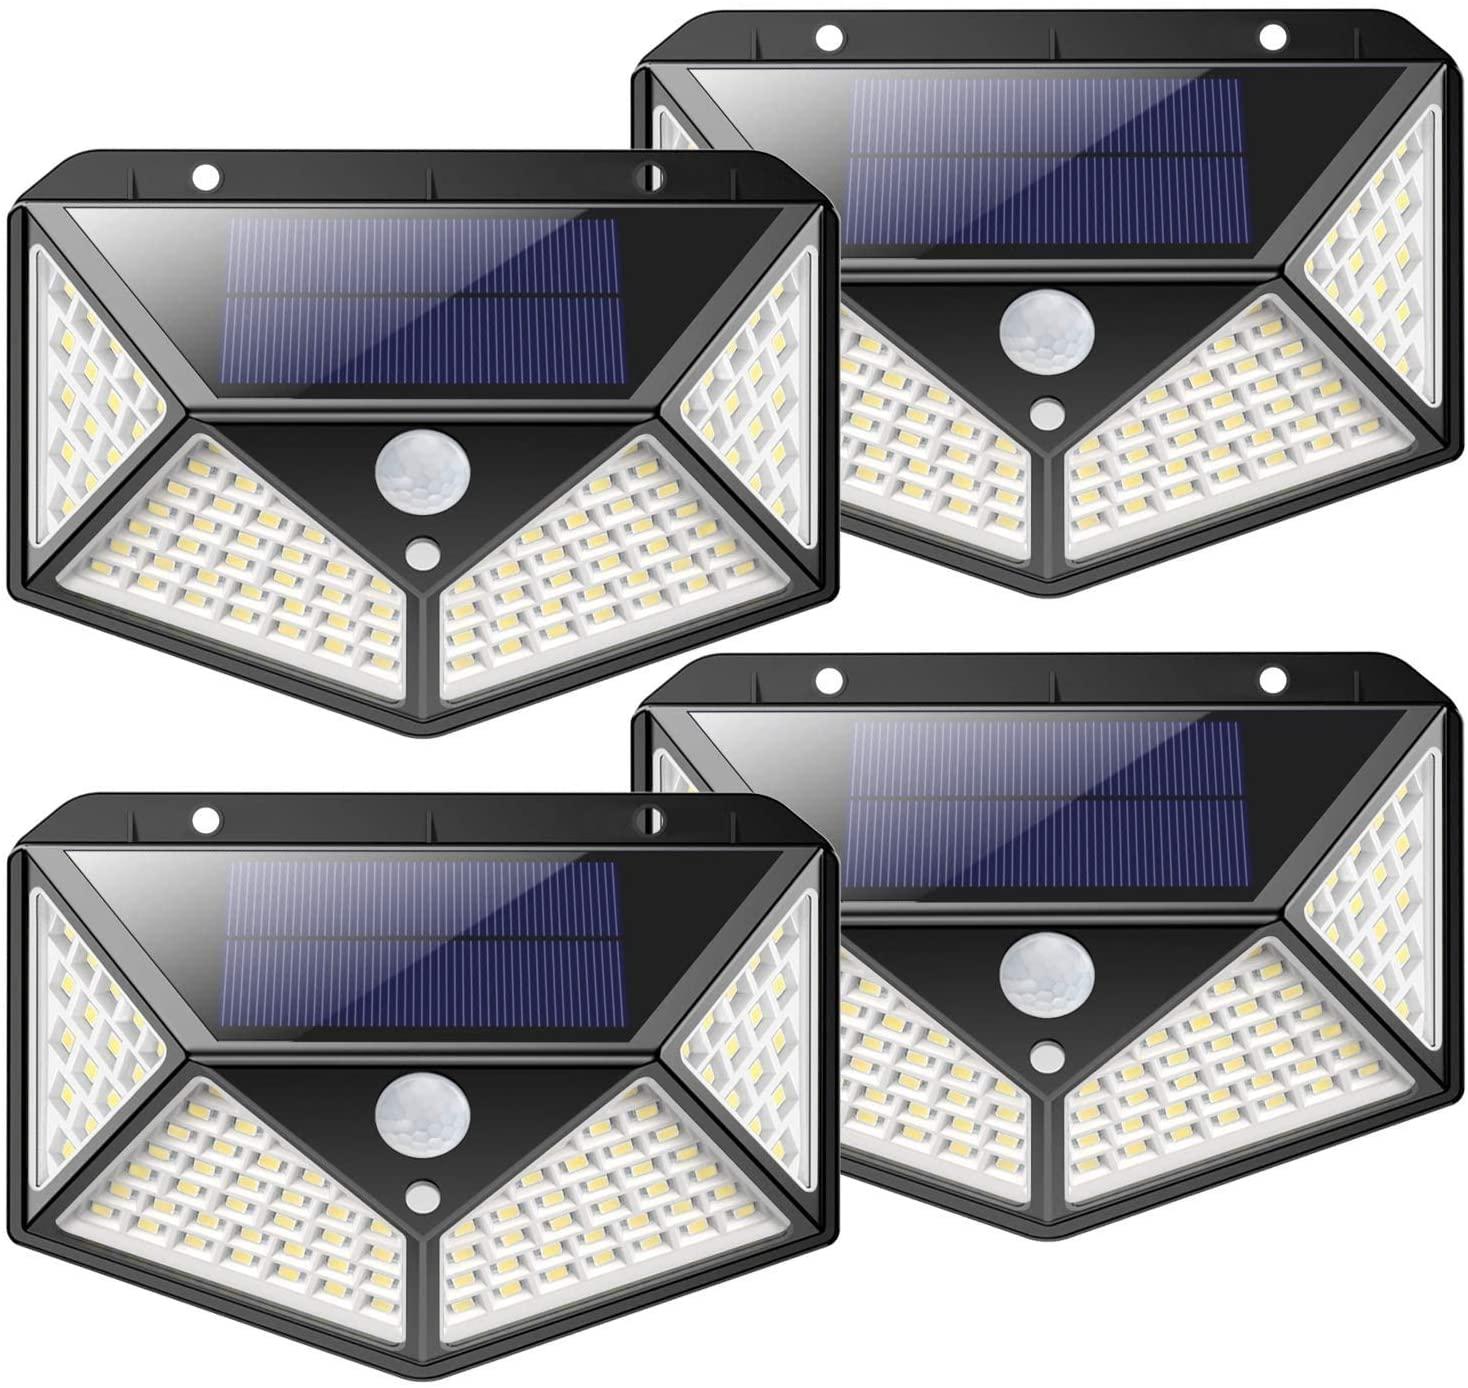 Solar Lights Outdoor, Kilponene [2200mAh Super Bright Energy Saving] 100 LED Motion Sensor Security Lights Solar Wall Lights 270º Solar Powered Lights Waterproof with 3 Modes for Outside (4 Pack)